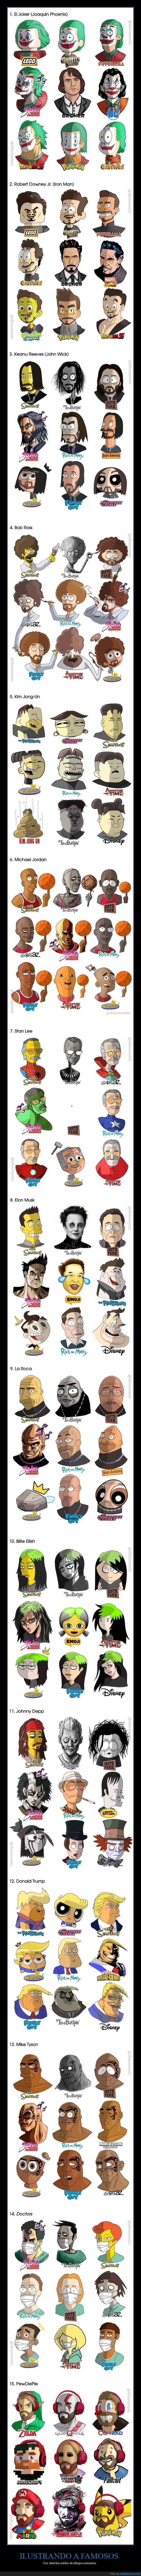 dibujos animados,famosos,ilustraciones